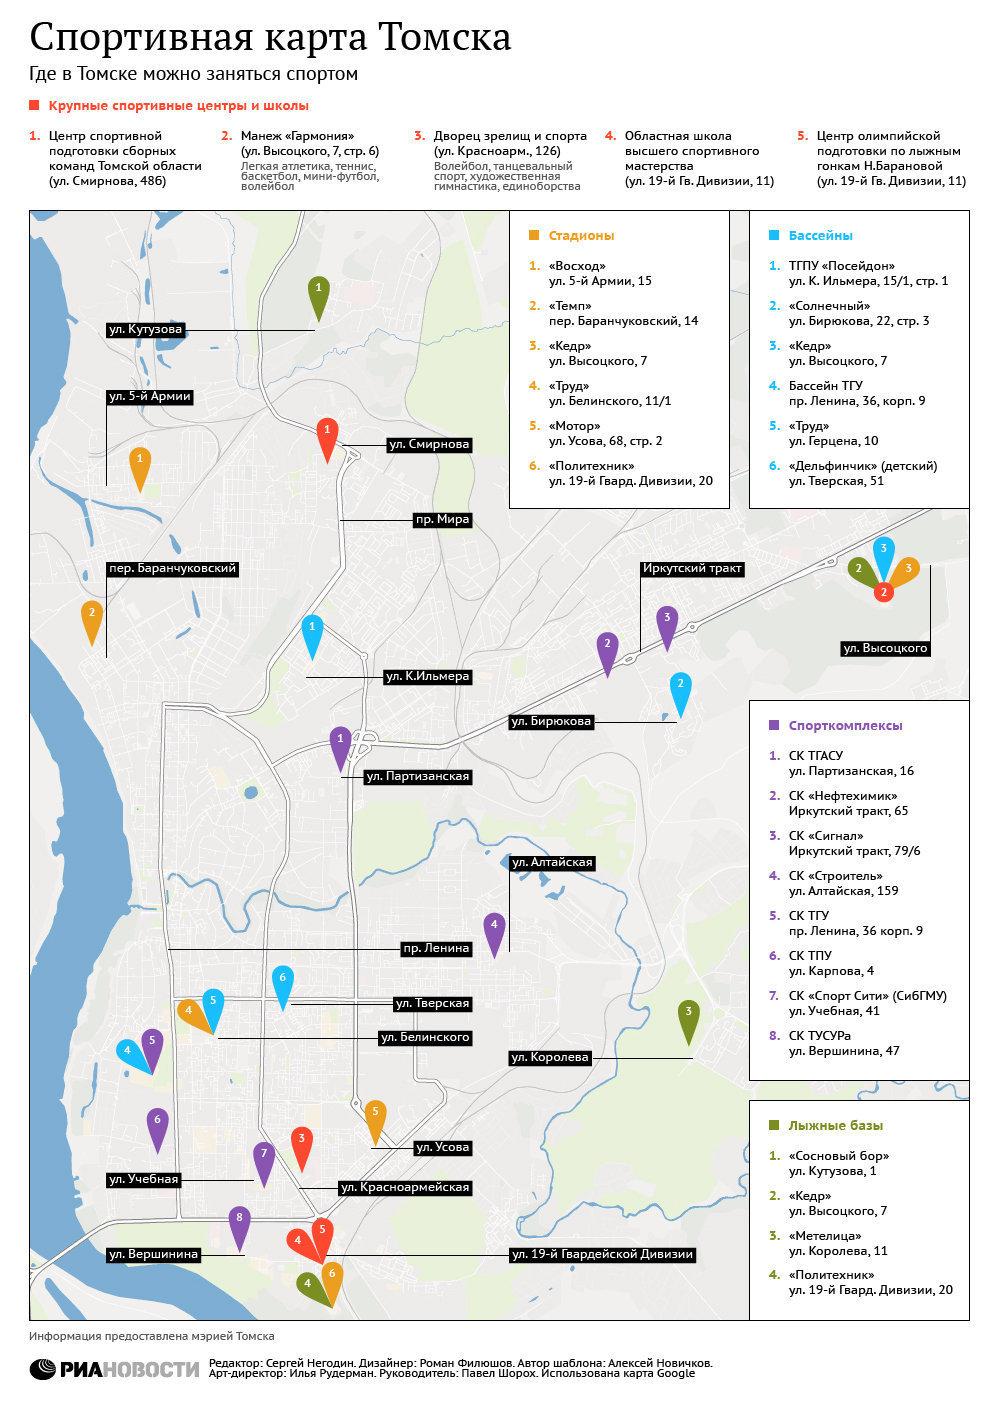 Спортивная карта Томска